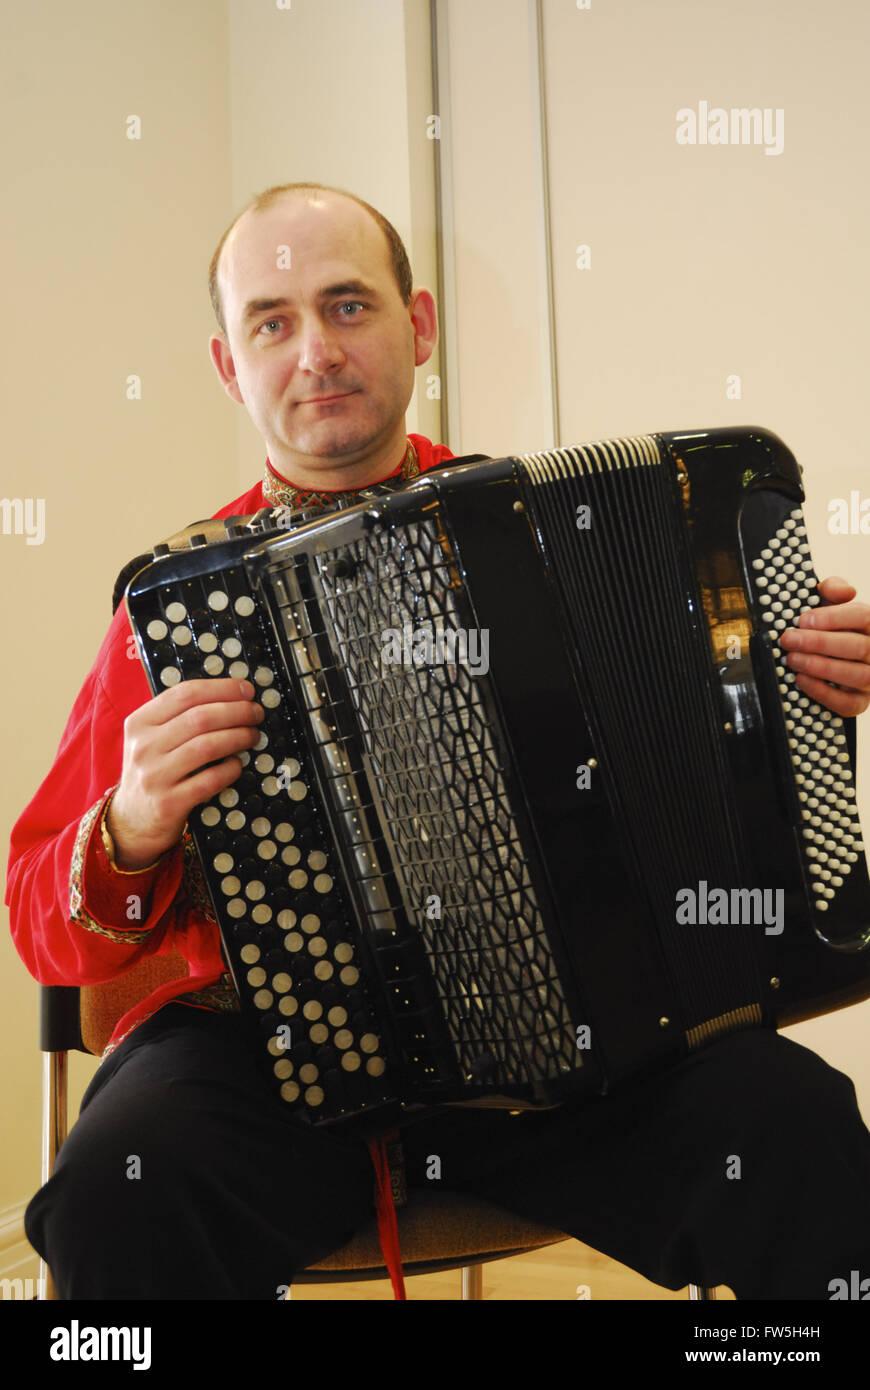 Accordion played by Nikolai Ryskov, in red Russian costume - Stock Image